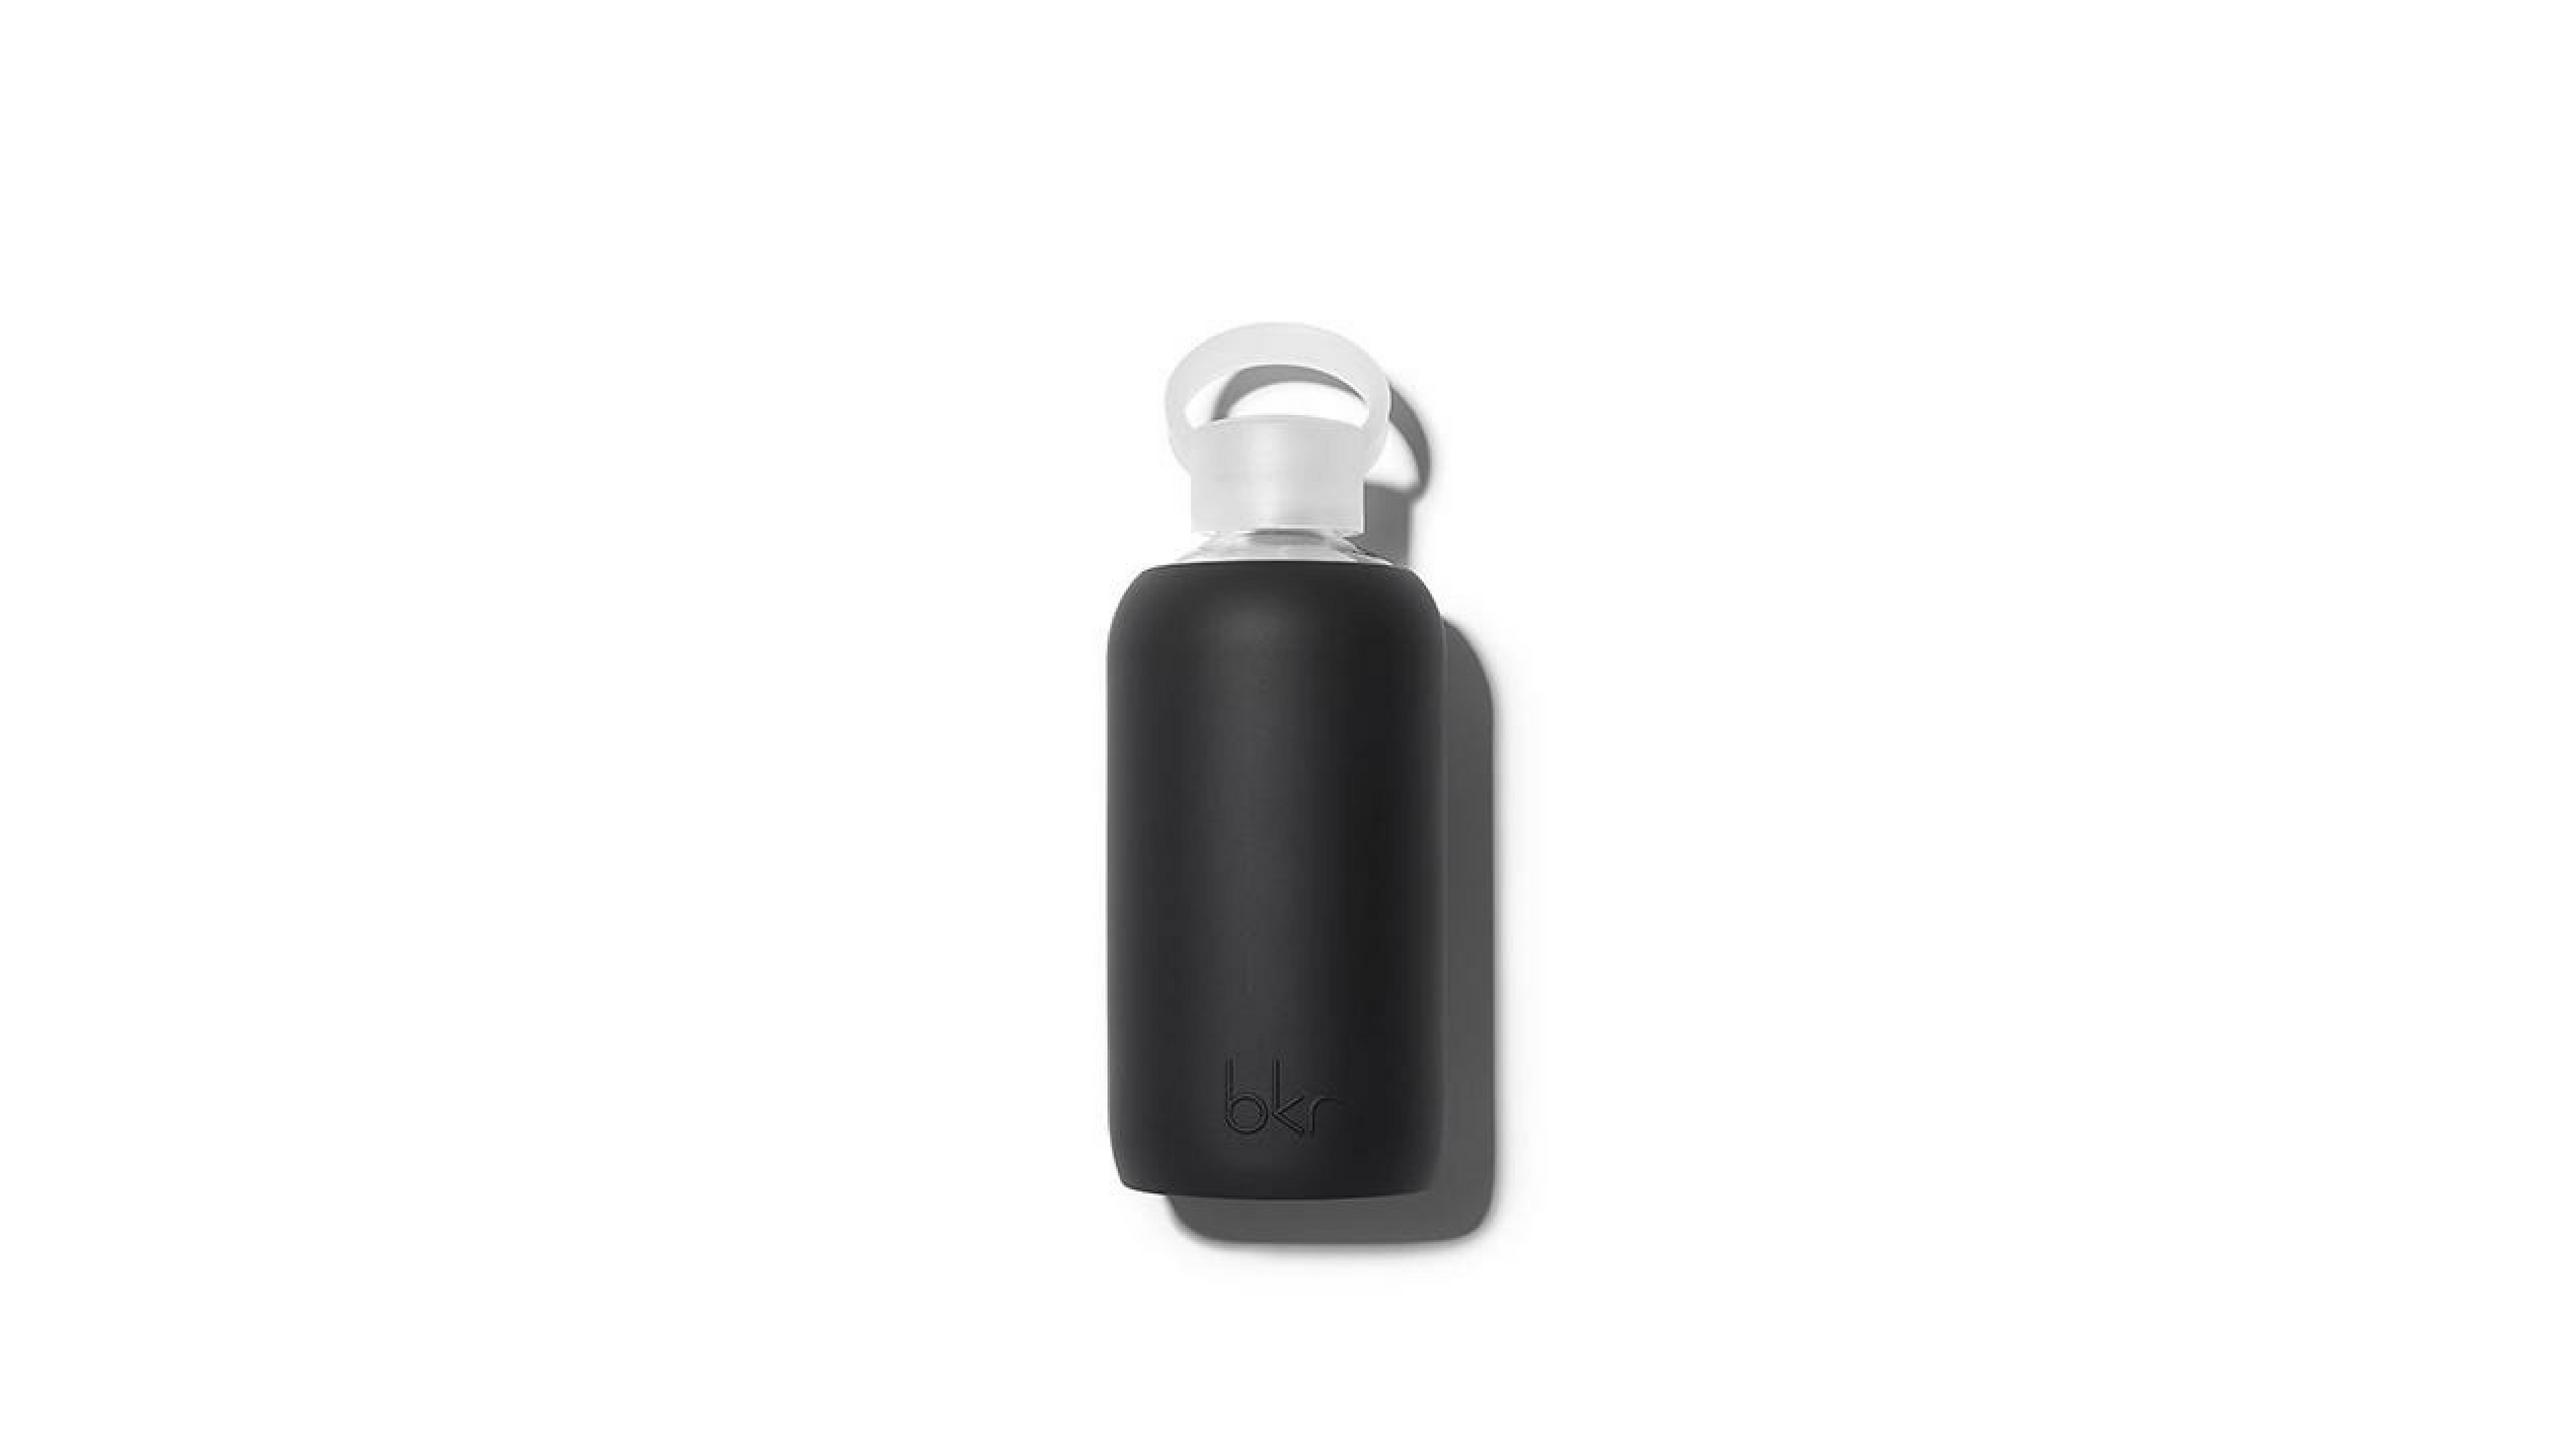 bkr black water bottle, long flight survival